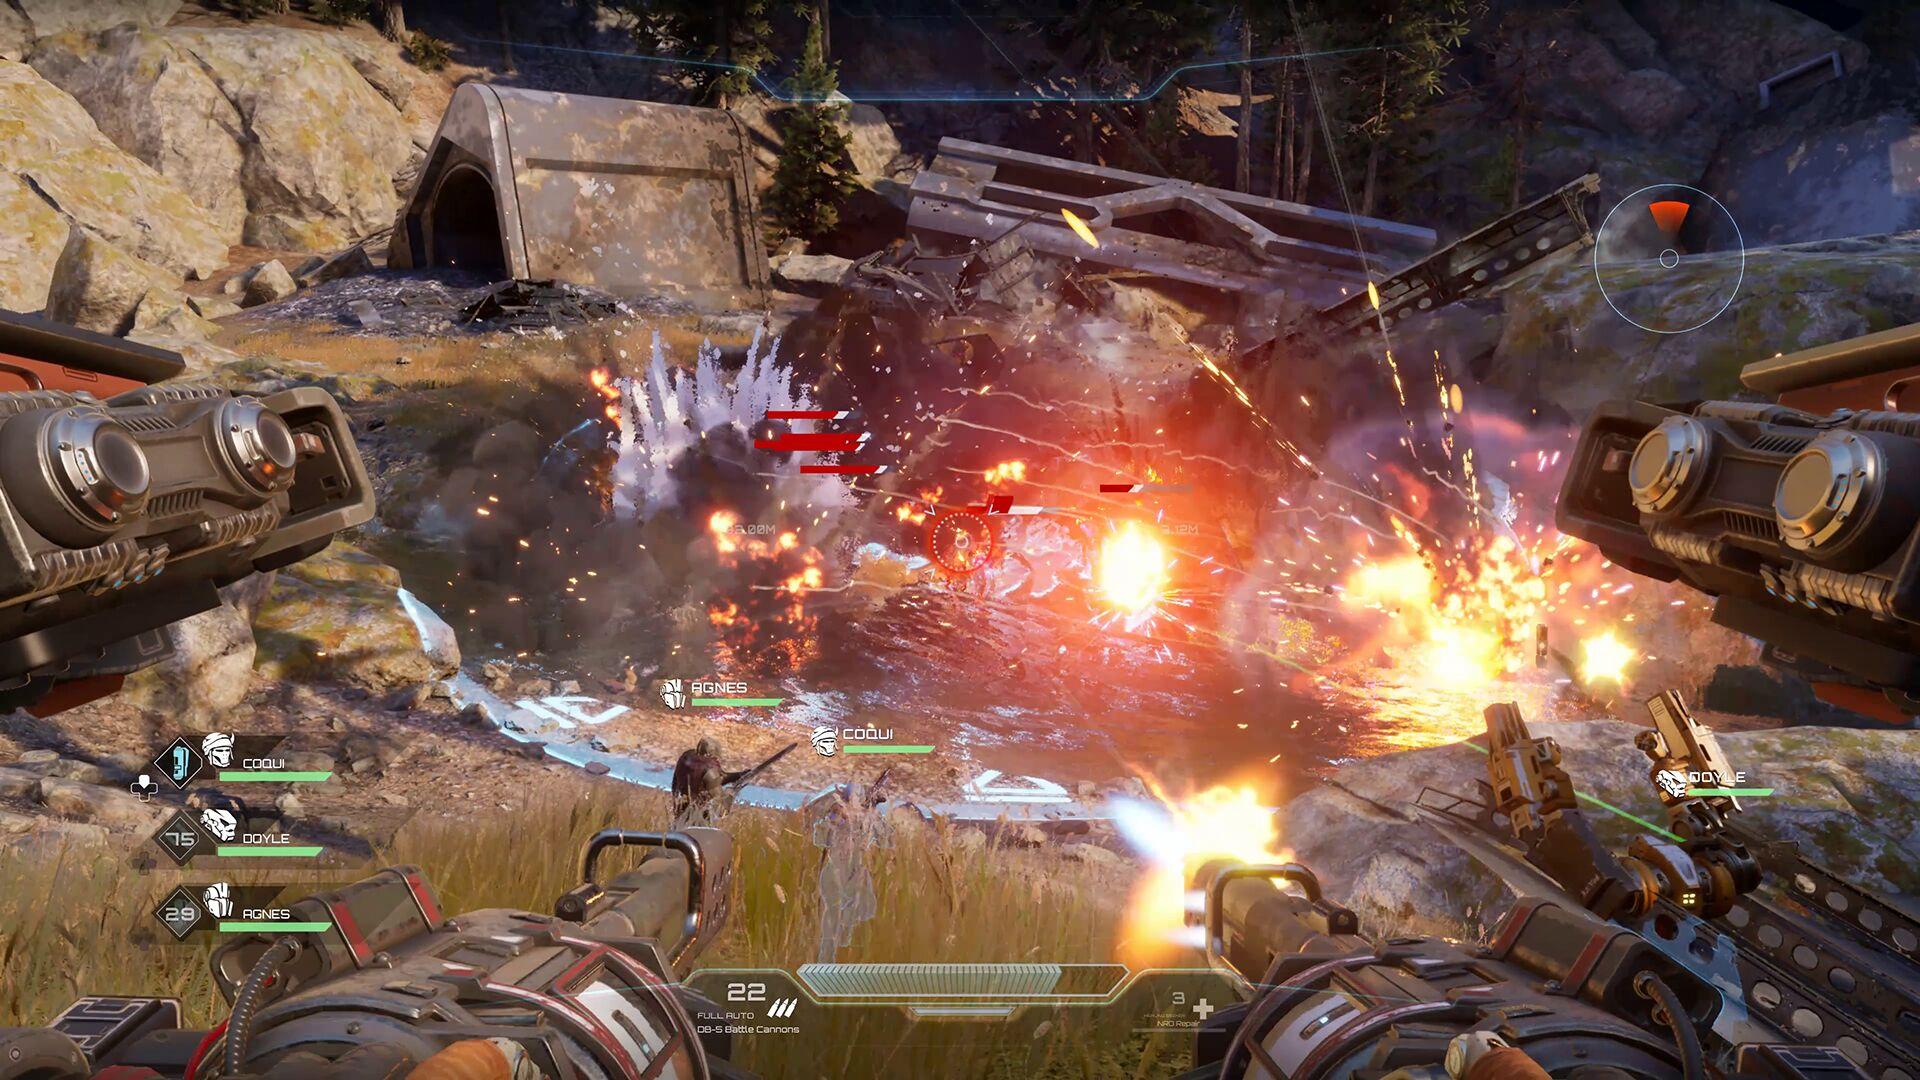 Jeux : Halo MC Gta V. Far cry 4.